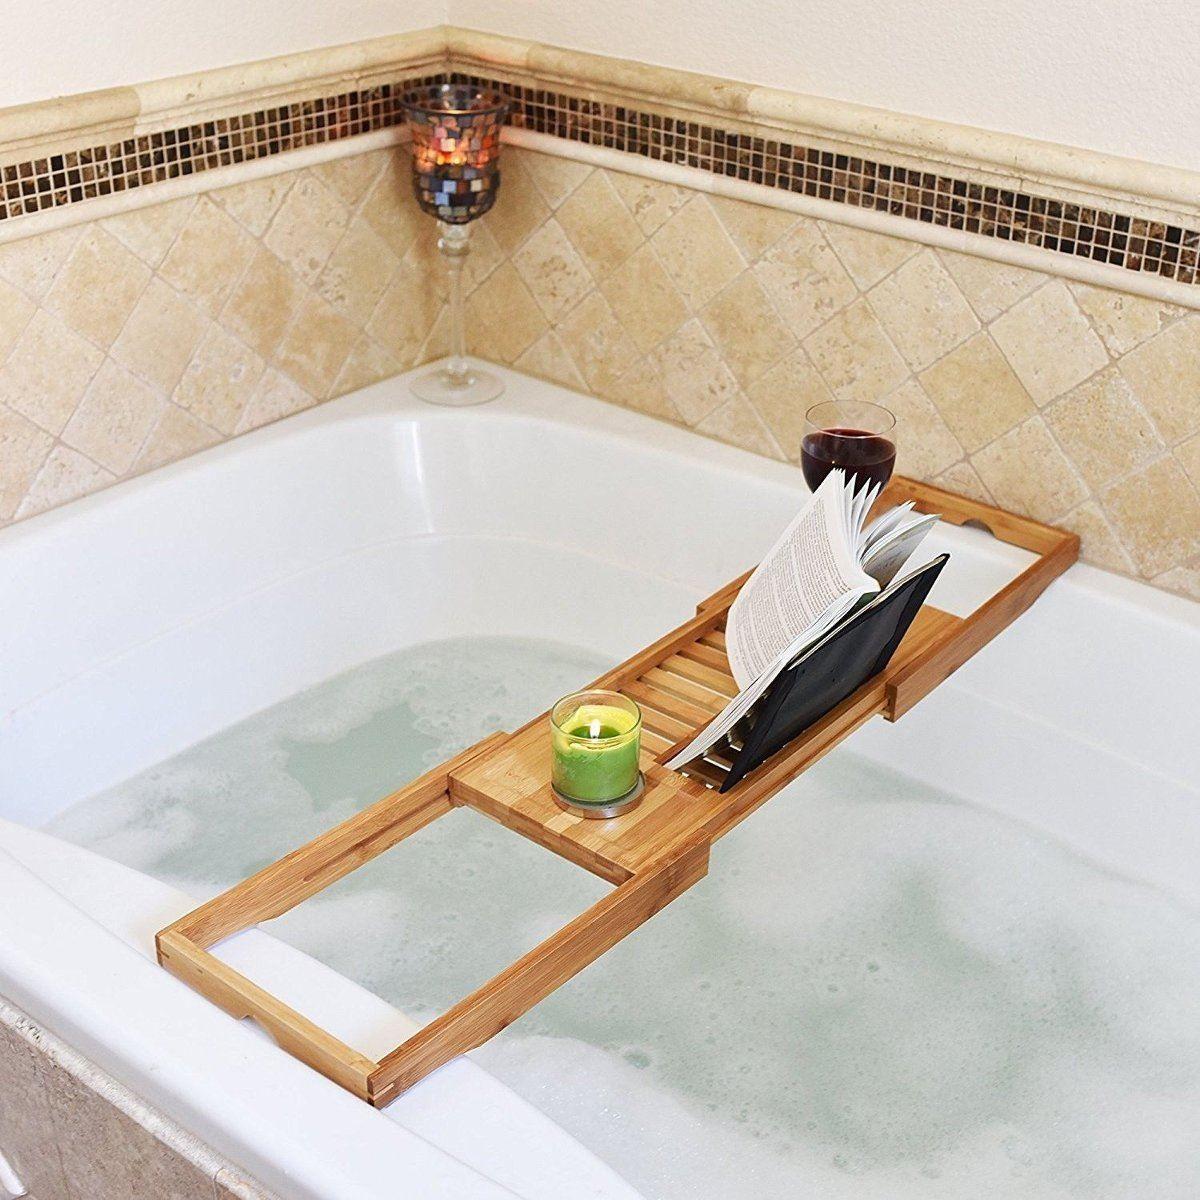 Bathroom Bath Tub Books phone Wine Cup Rack Shower Tray Holder Home Hotel Stand Sundries Organizer Adjustable Bathroom Shelves